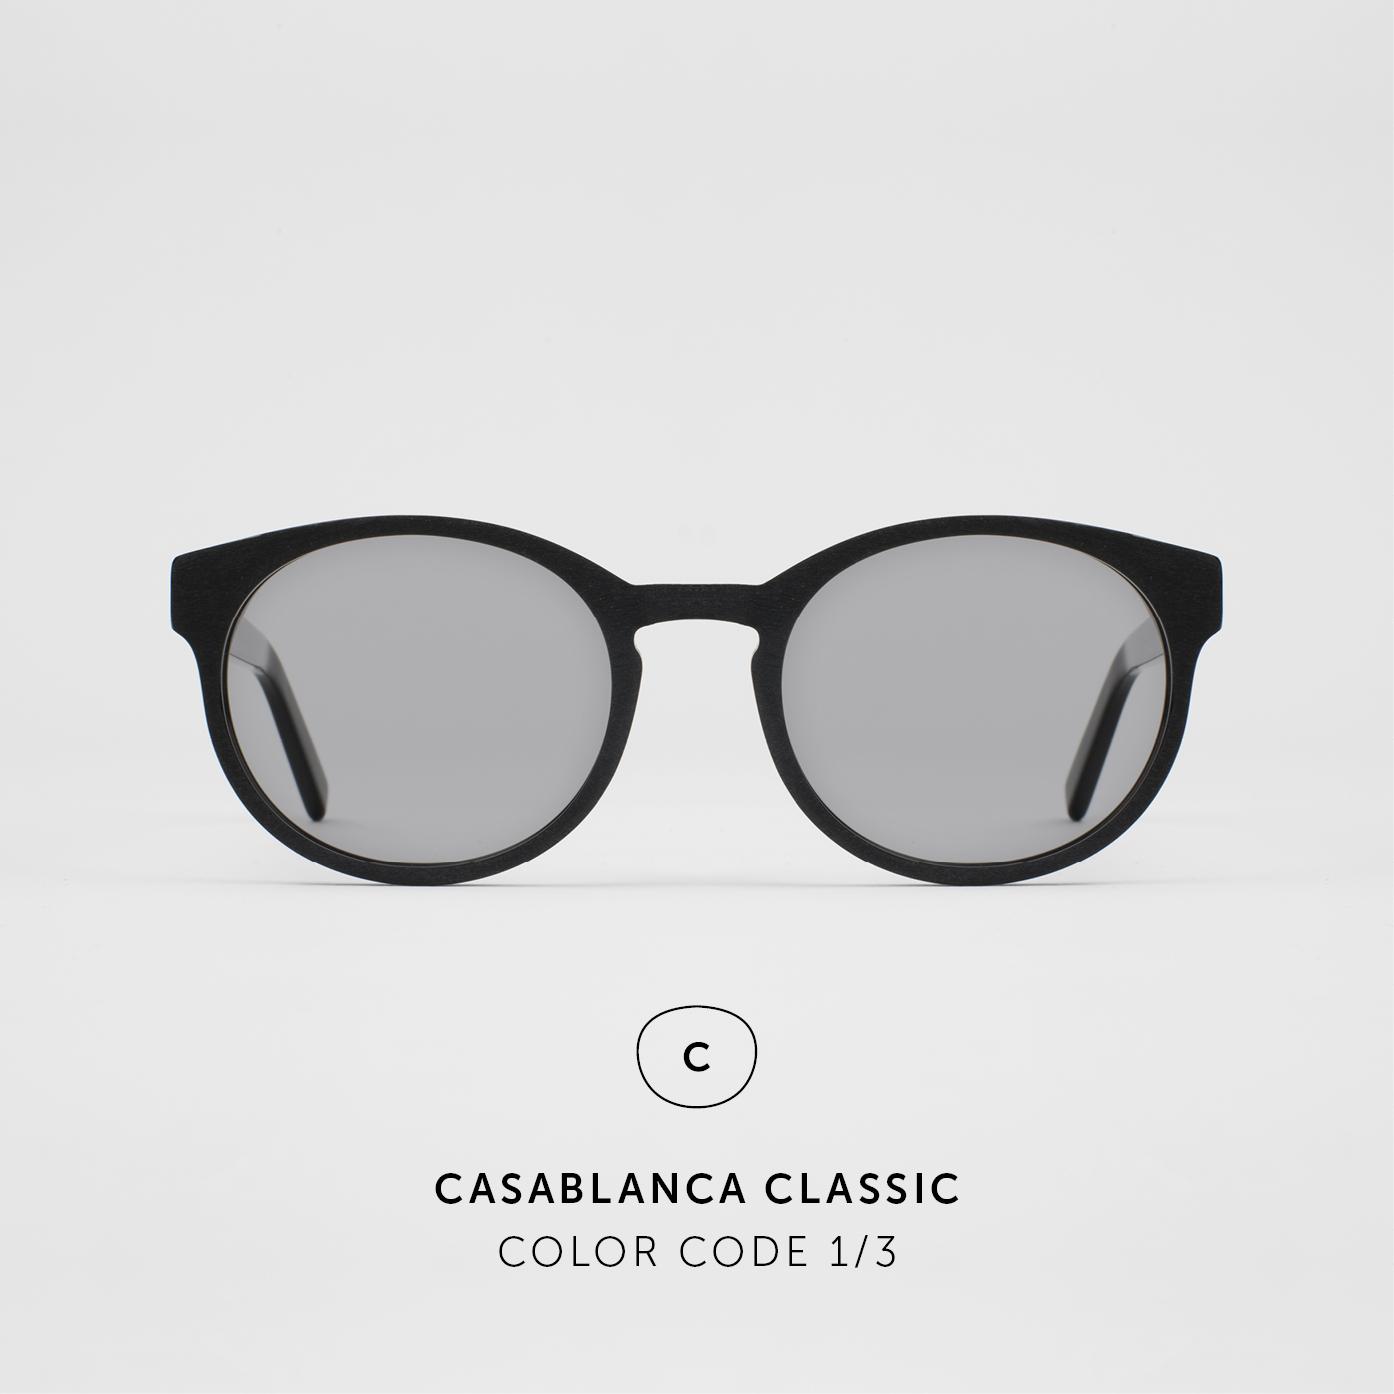 CasablancaClassic11.jpg